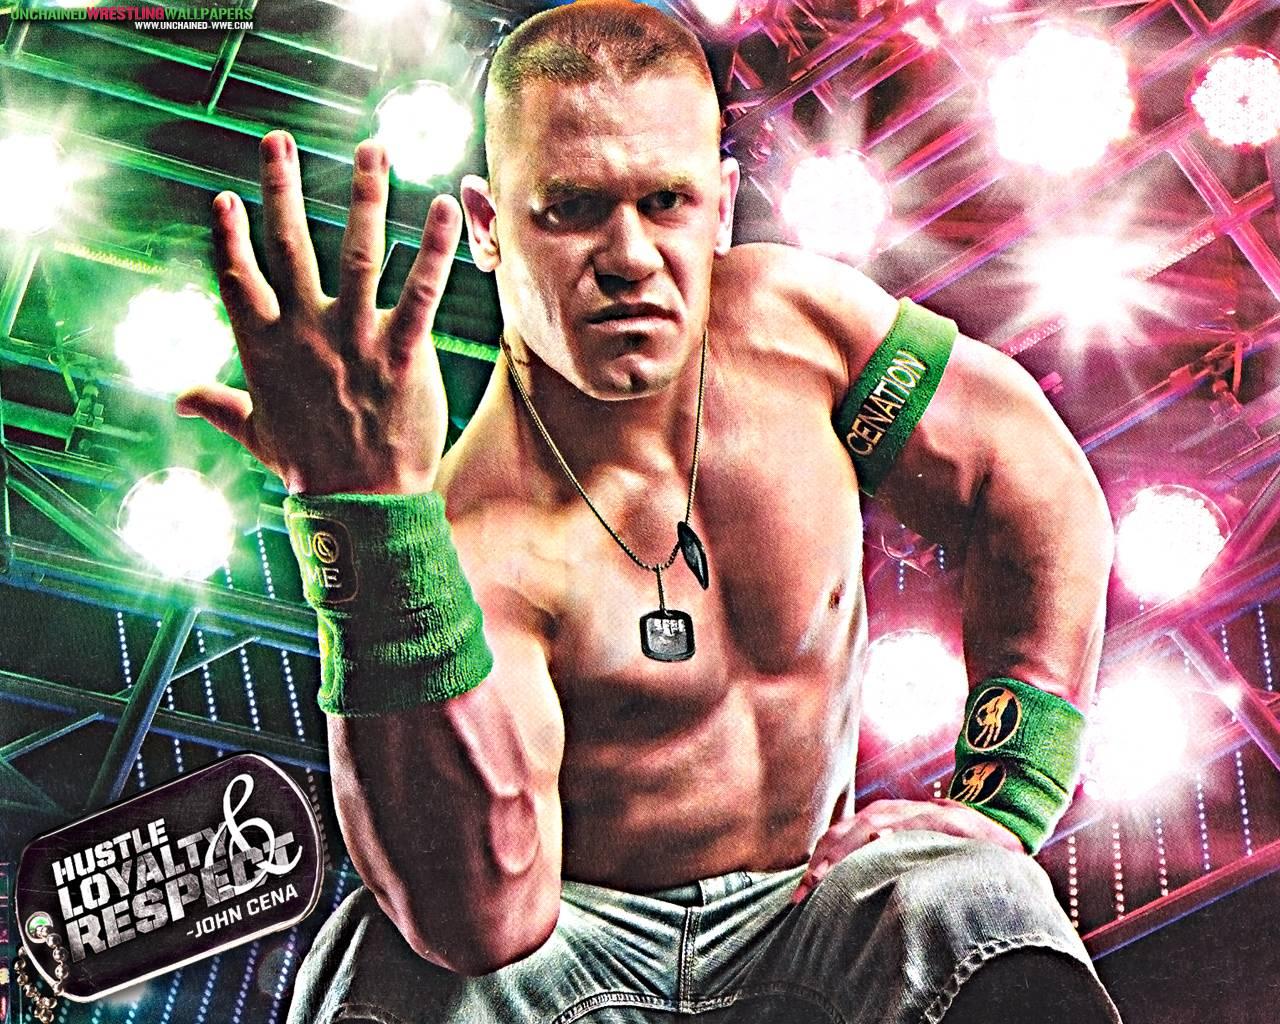 WWE John Cena 56 1512 HD Wallpaper